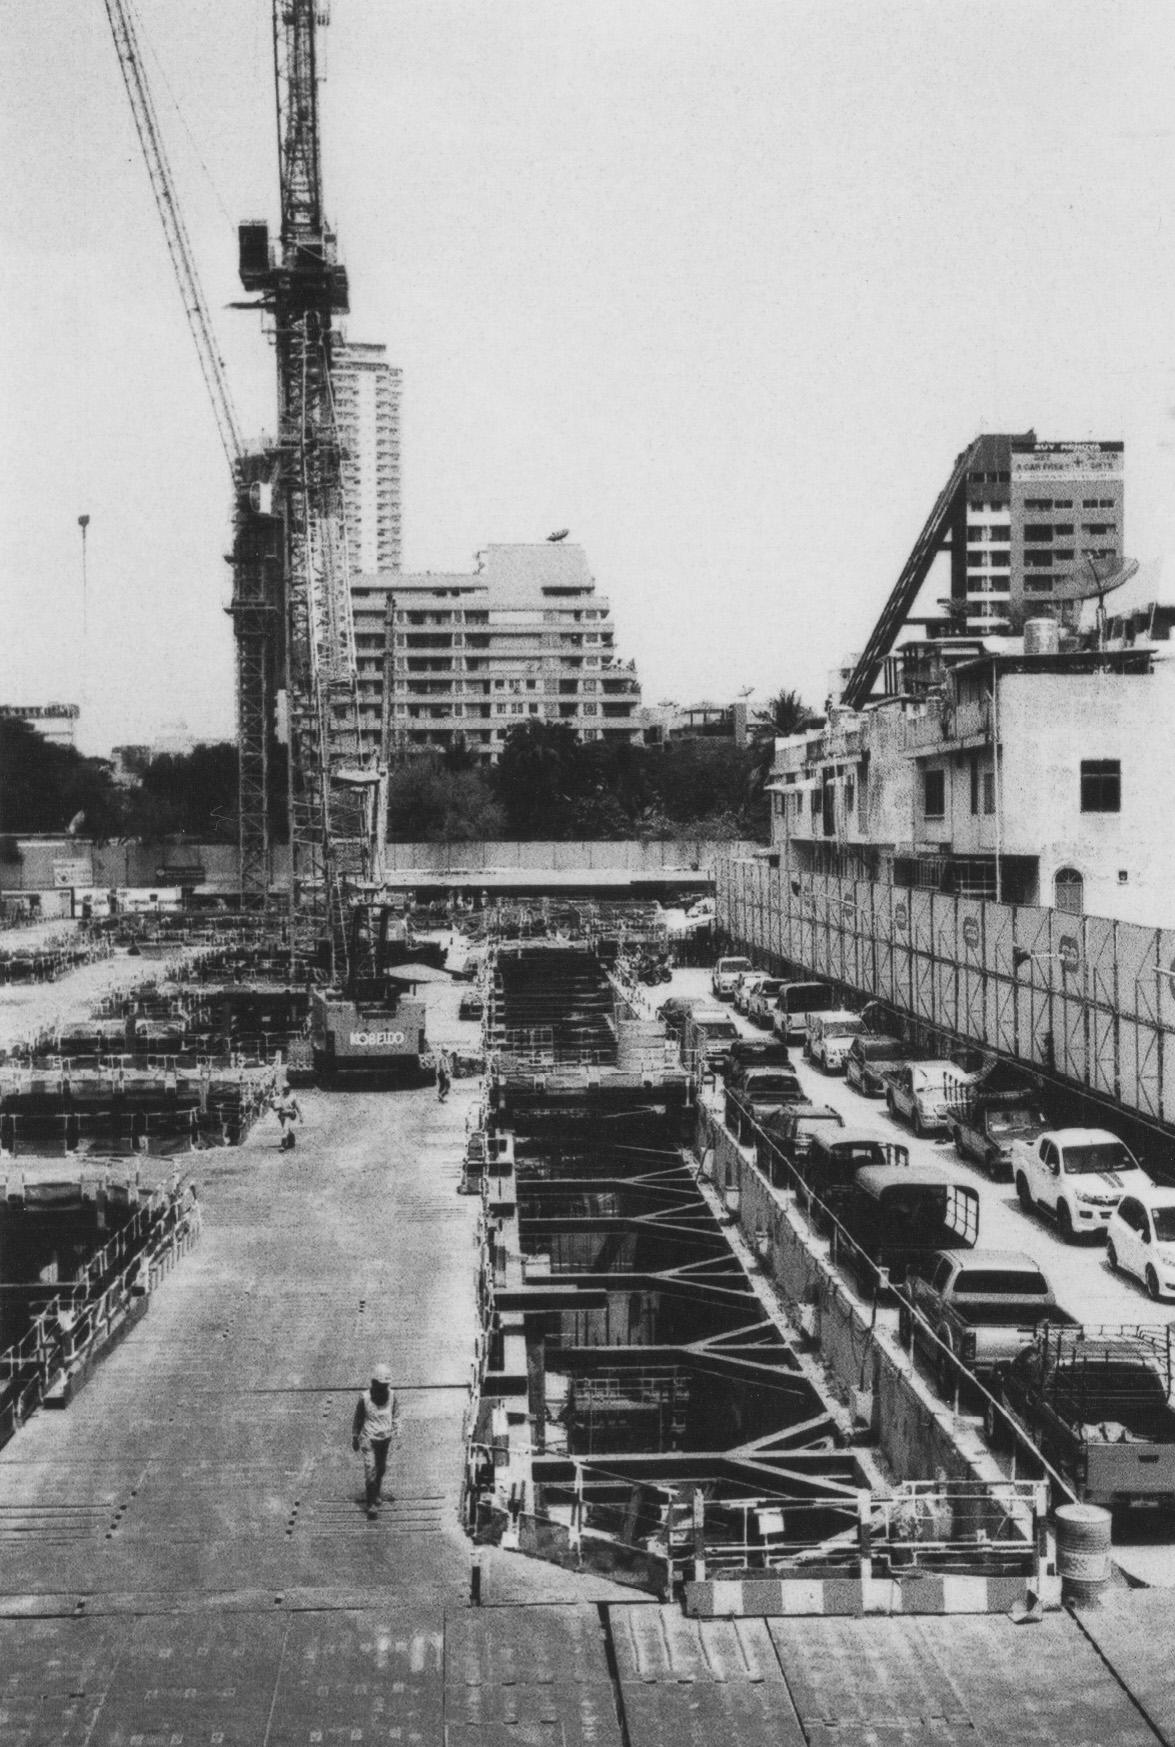 constructing Bangkok in progress, please wait.